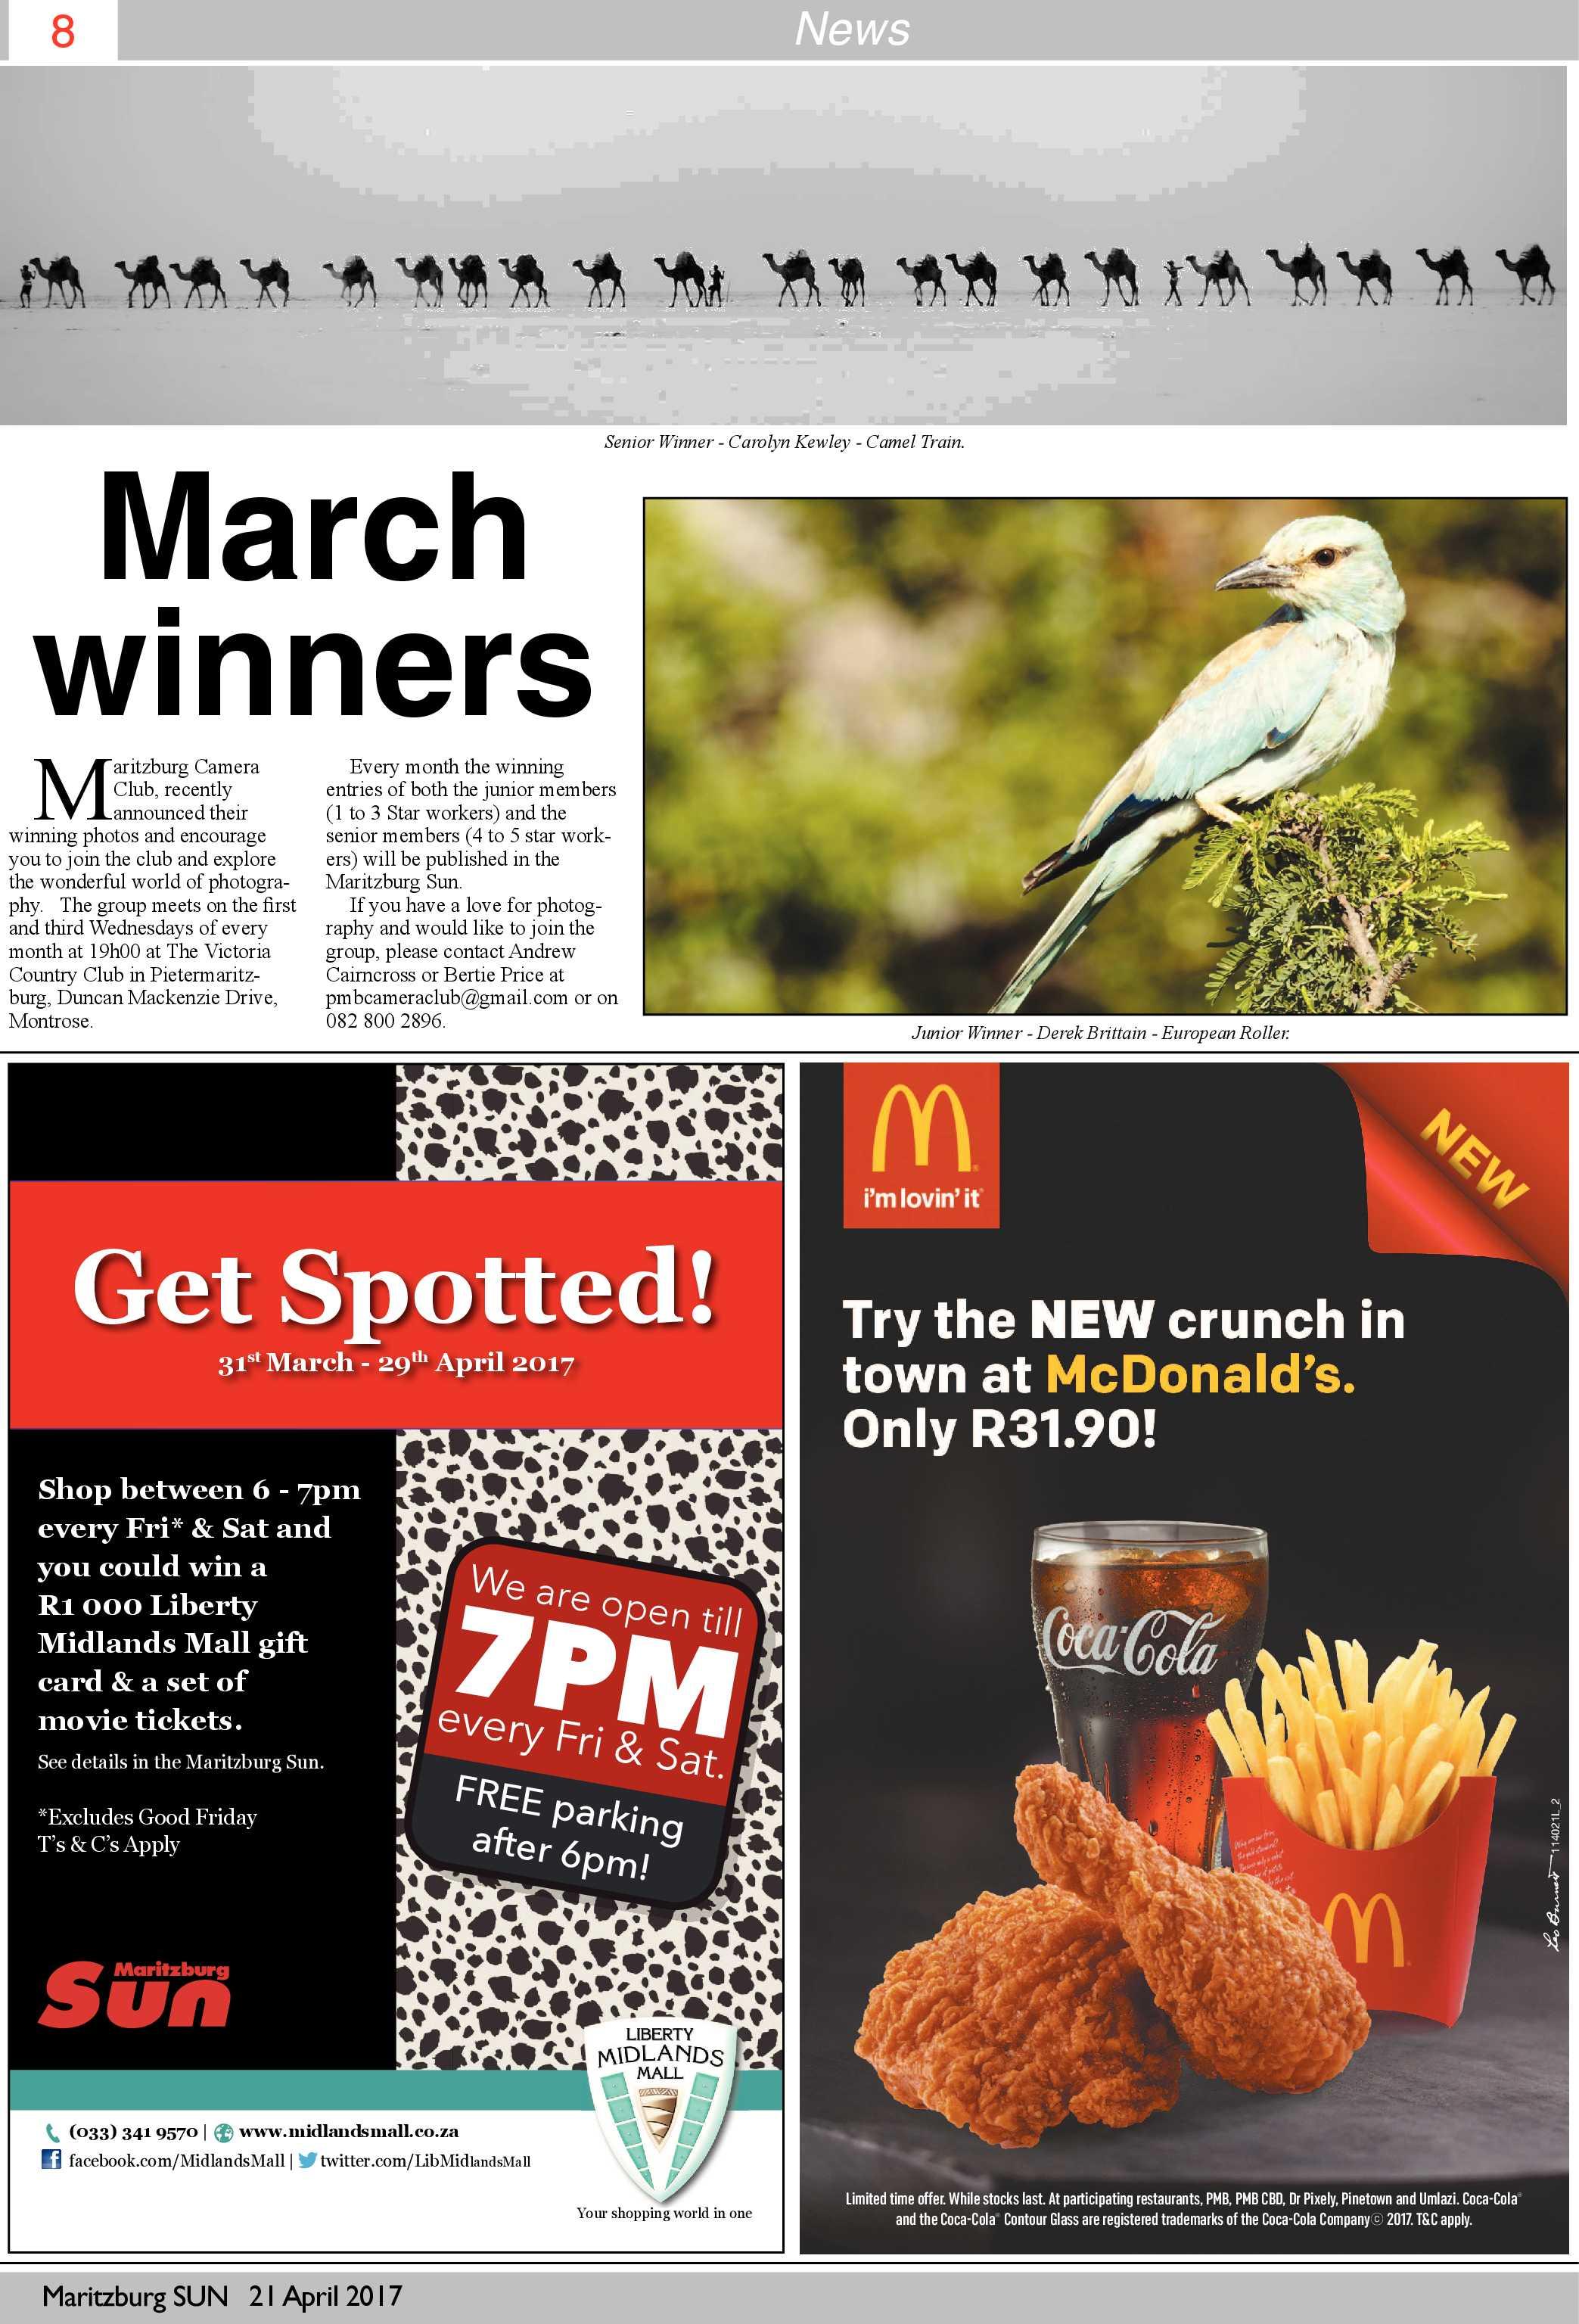 maritzburgsun-21-04-2017-epapers-page-8